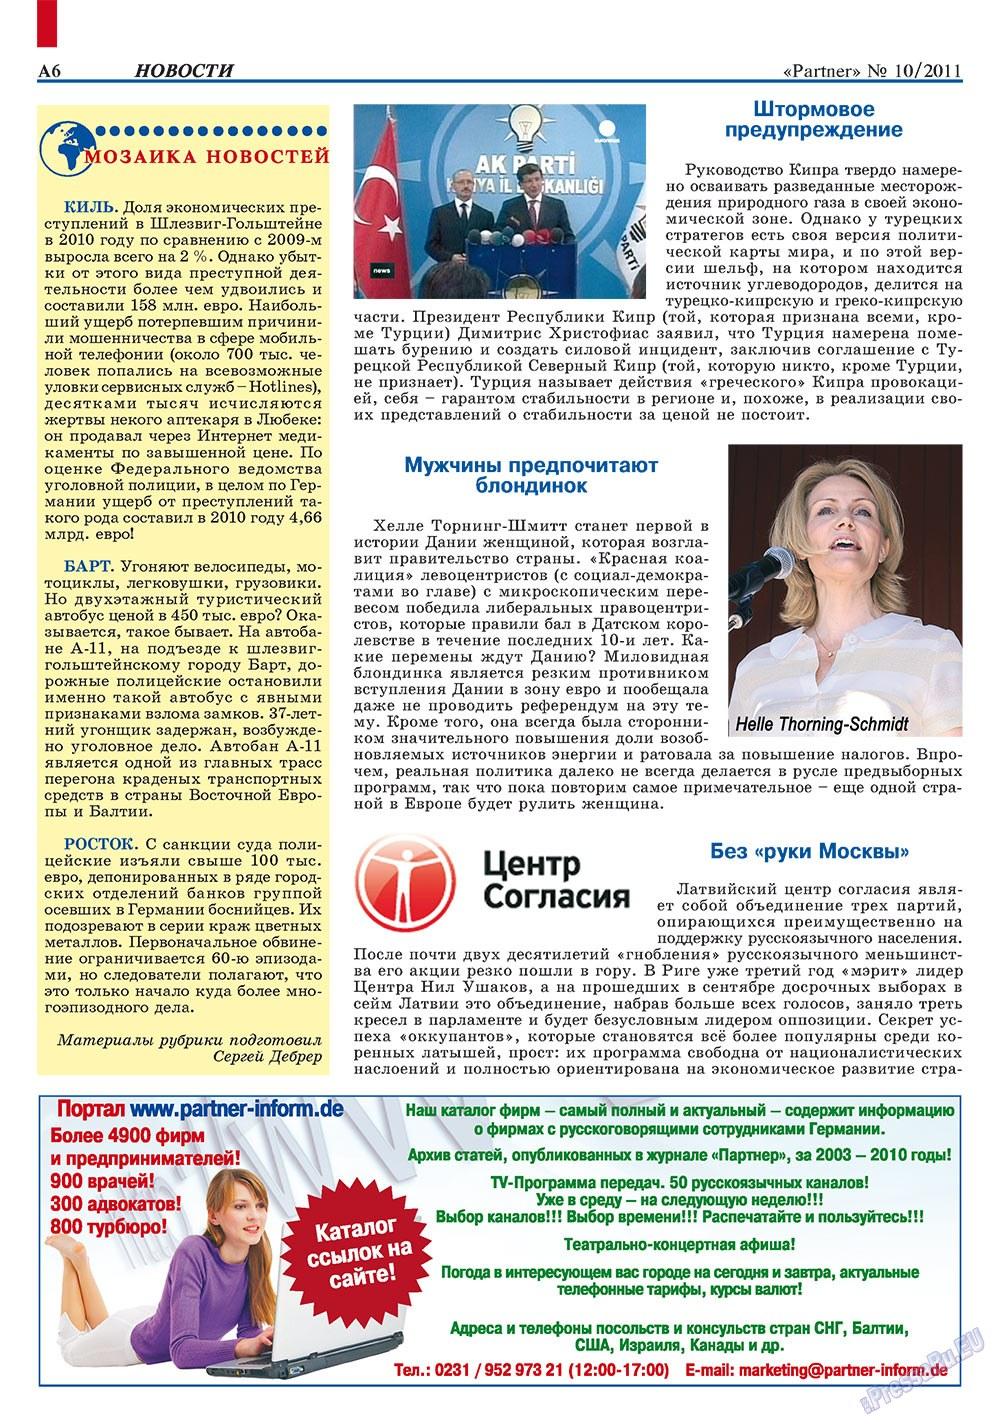 Партнер-север (журнал). 2011 год, номер 10, стр. 6